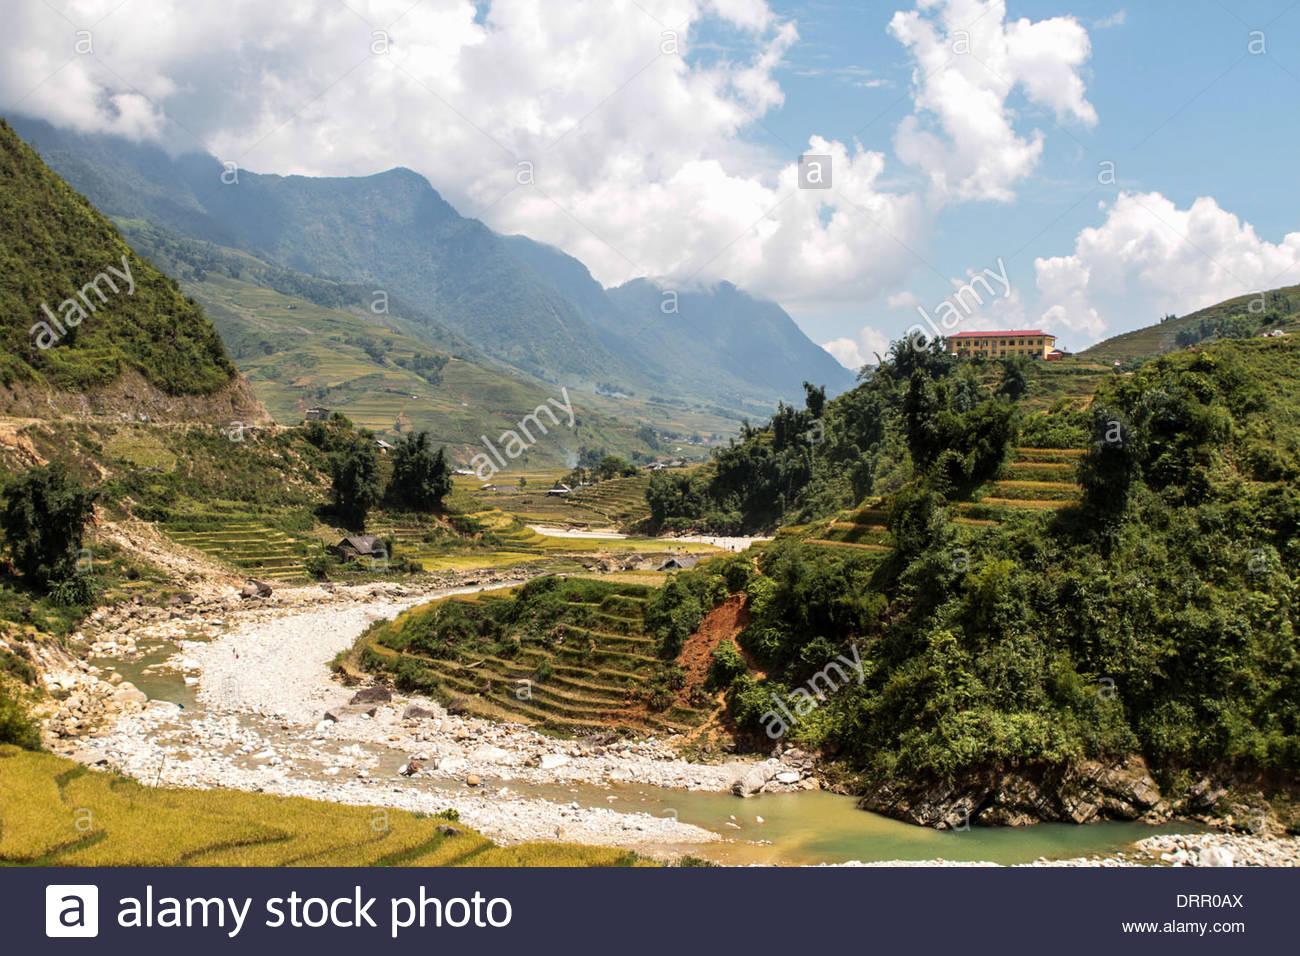 North Vietnam, Sapa, Asia - Stock Image